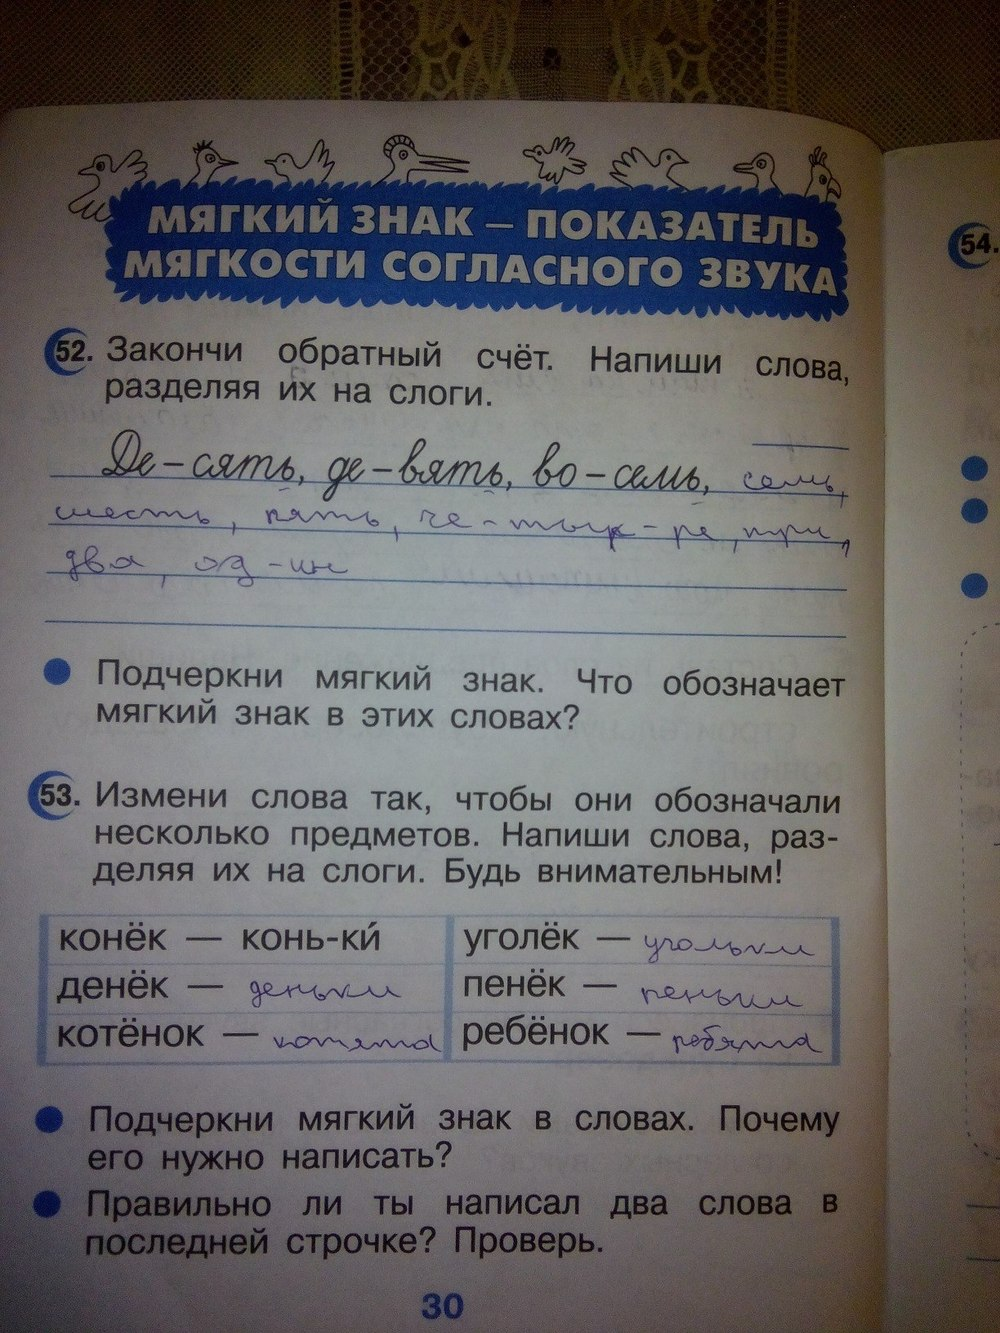 2 2 часть гдз русскому языку класс по рабочая пнш тетрадь